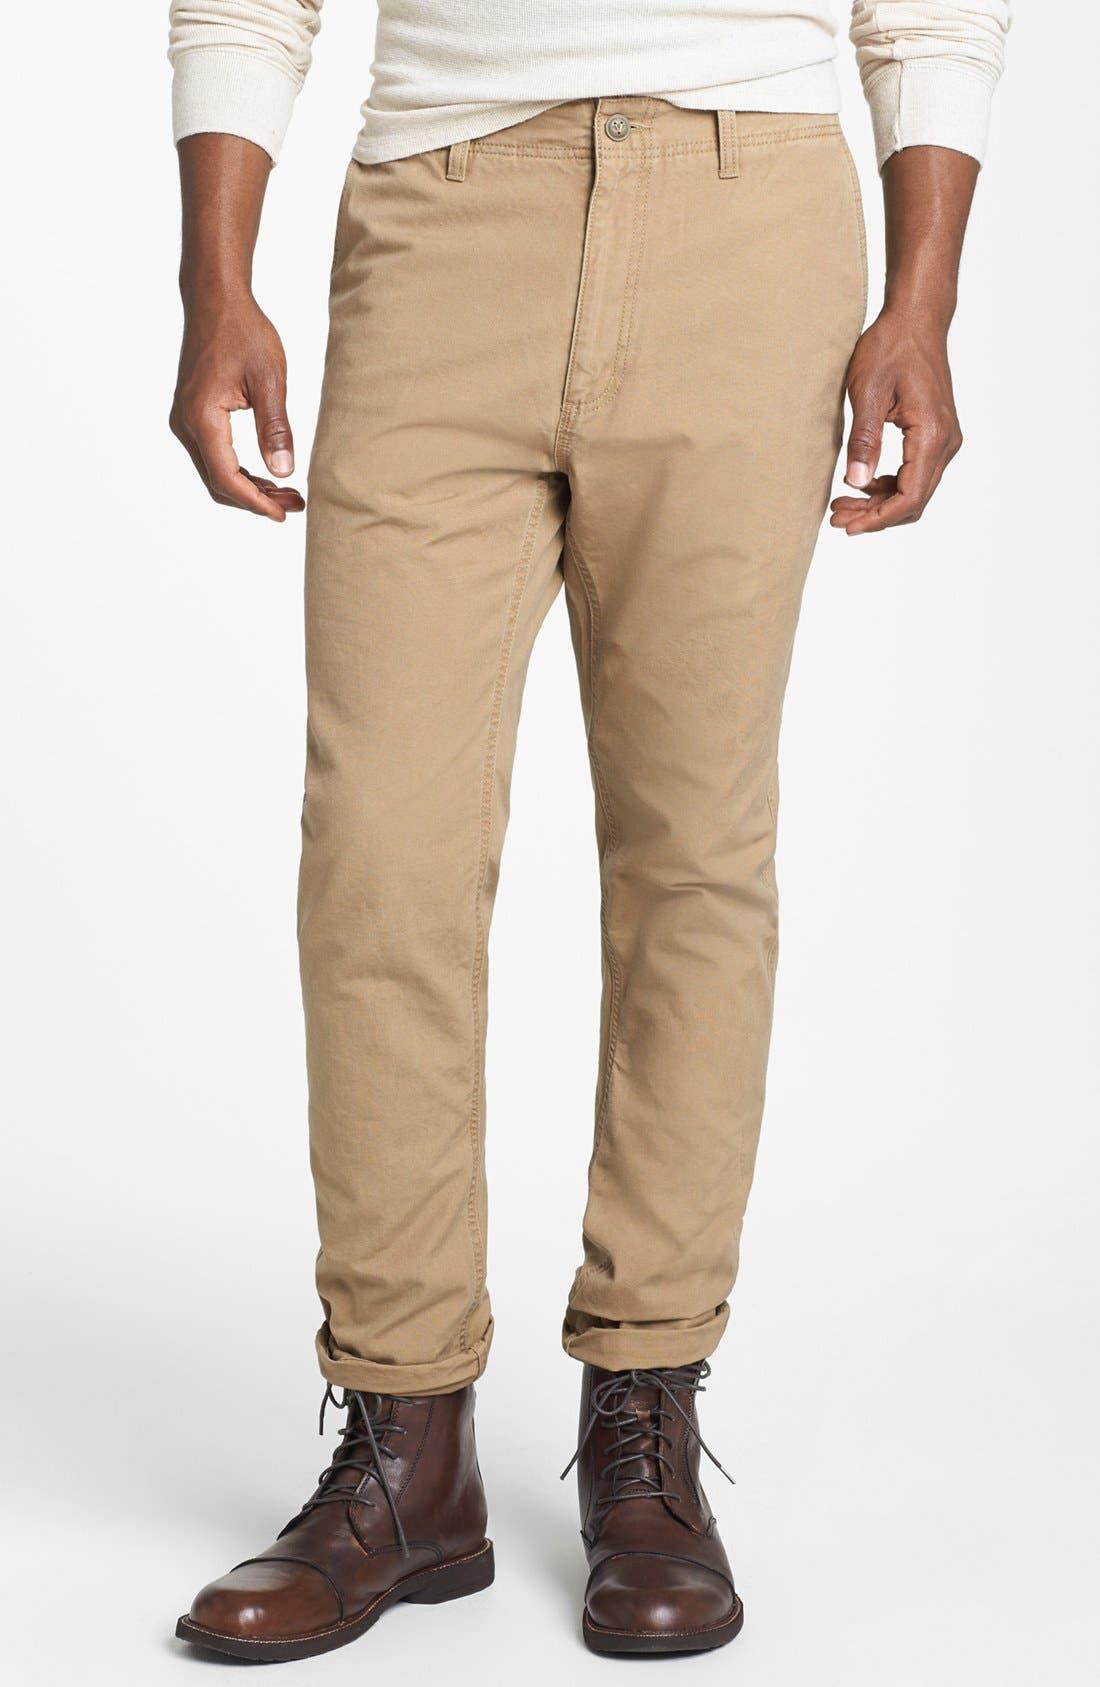 Main Image - Vans 'Cali Carpenter' Slim Fit Canvas Pants